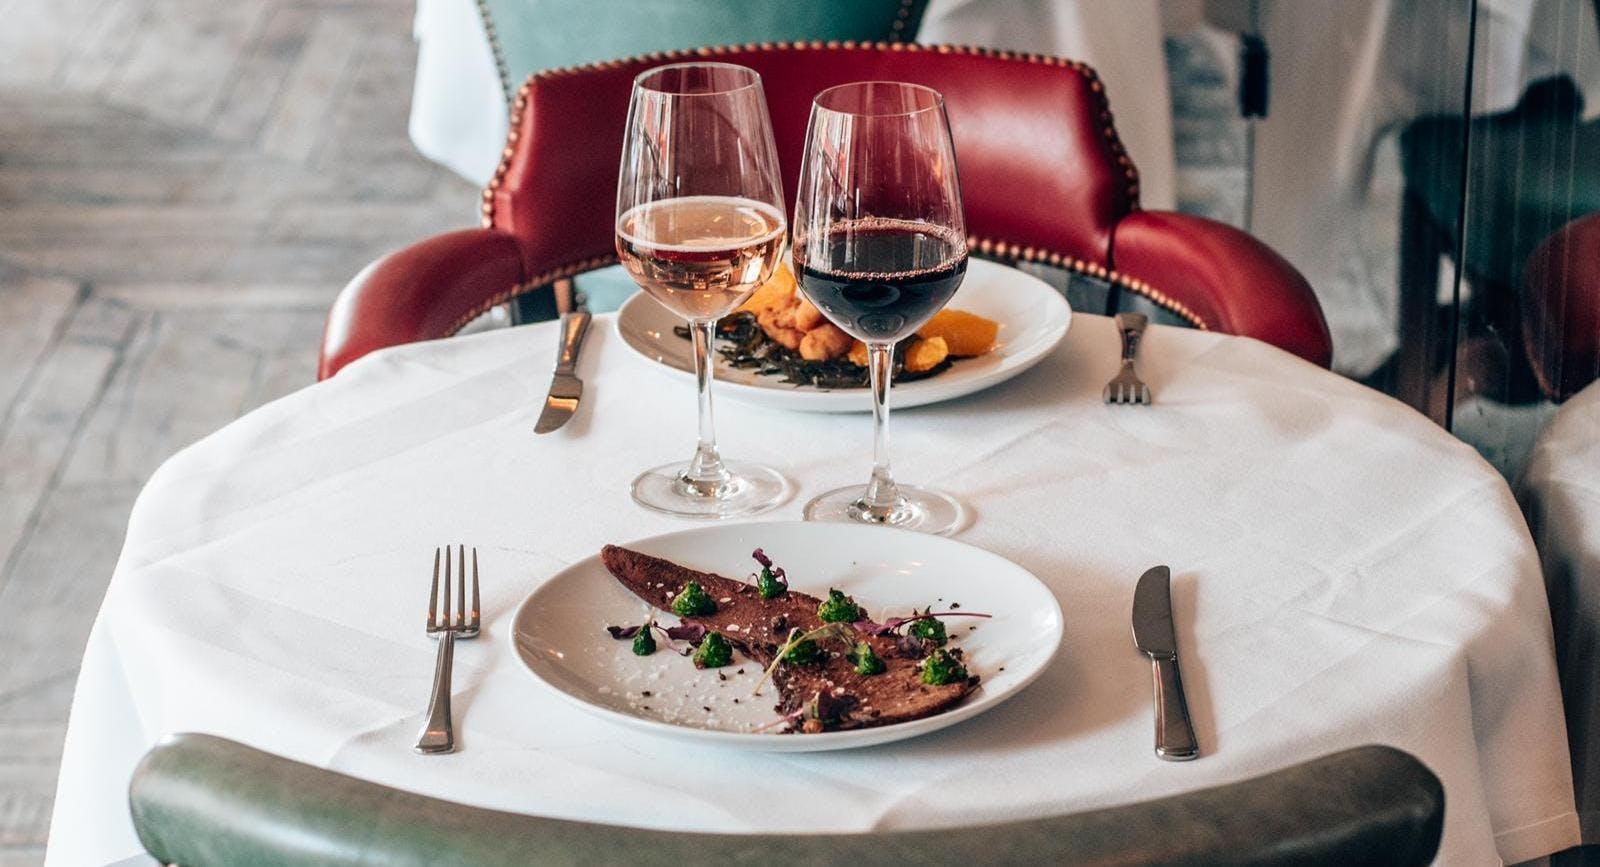 Photo of restaurant Macellaio RC - Soho in Soho, London